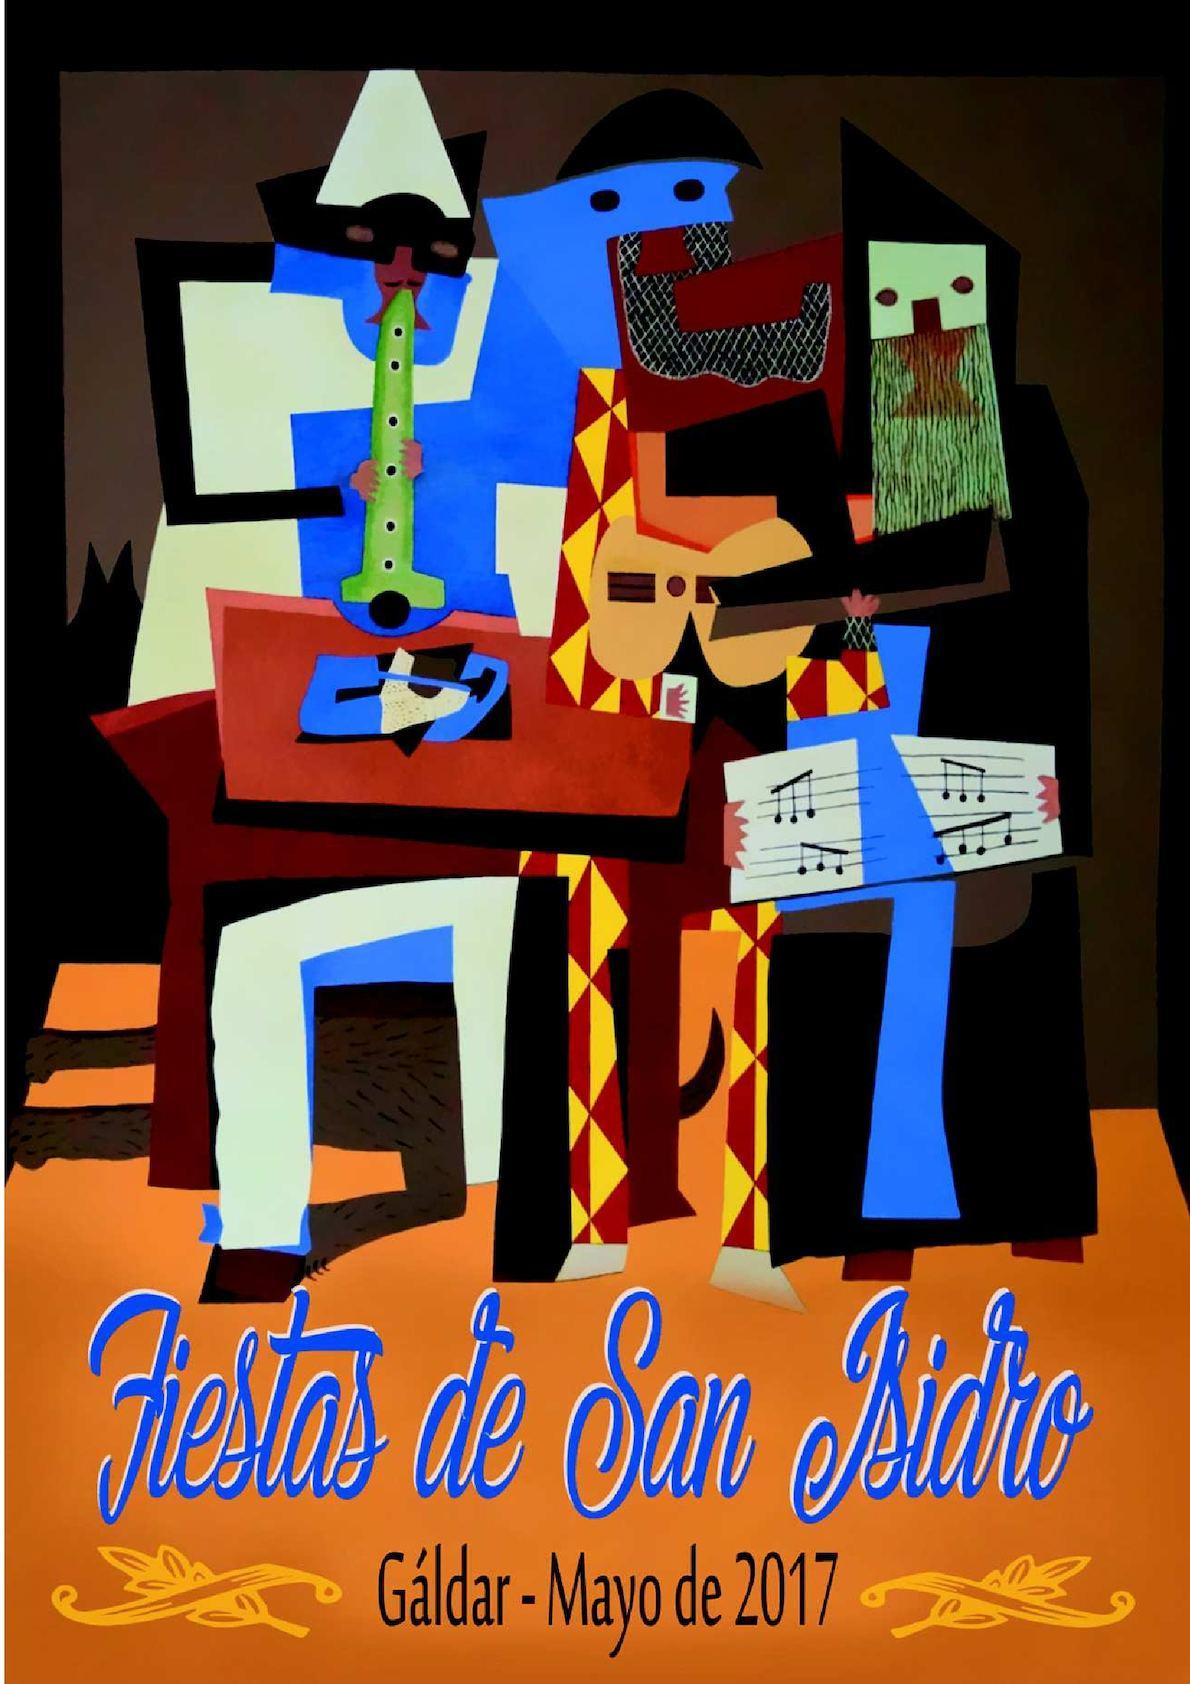 Programa de las fiestas de San Isidro Labrador 2017